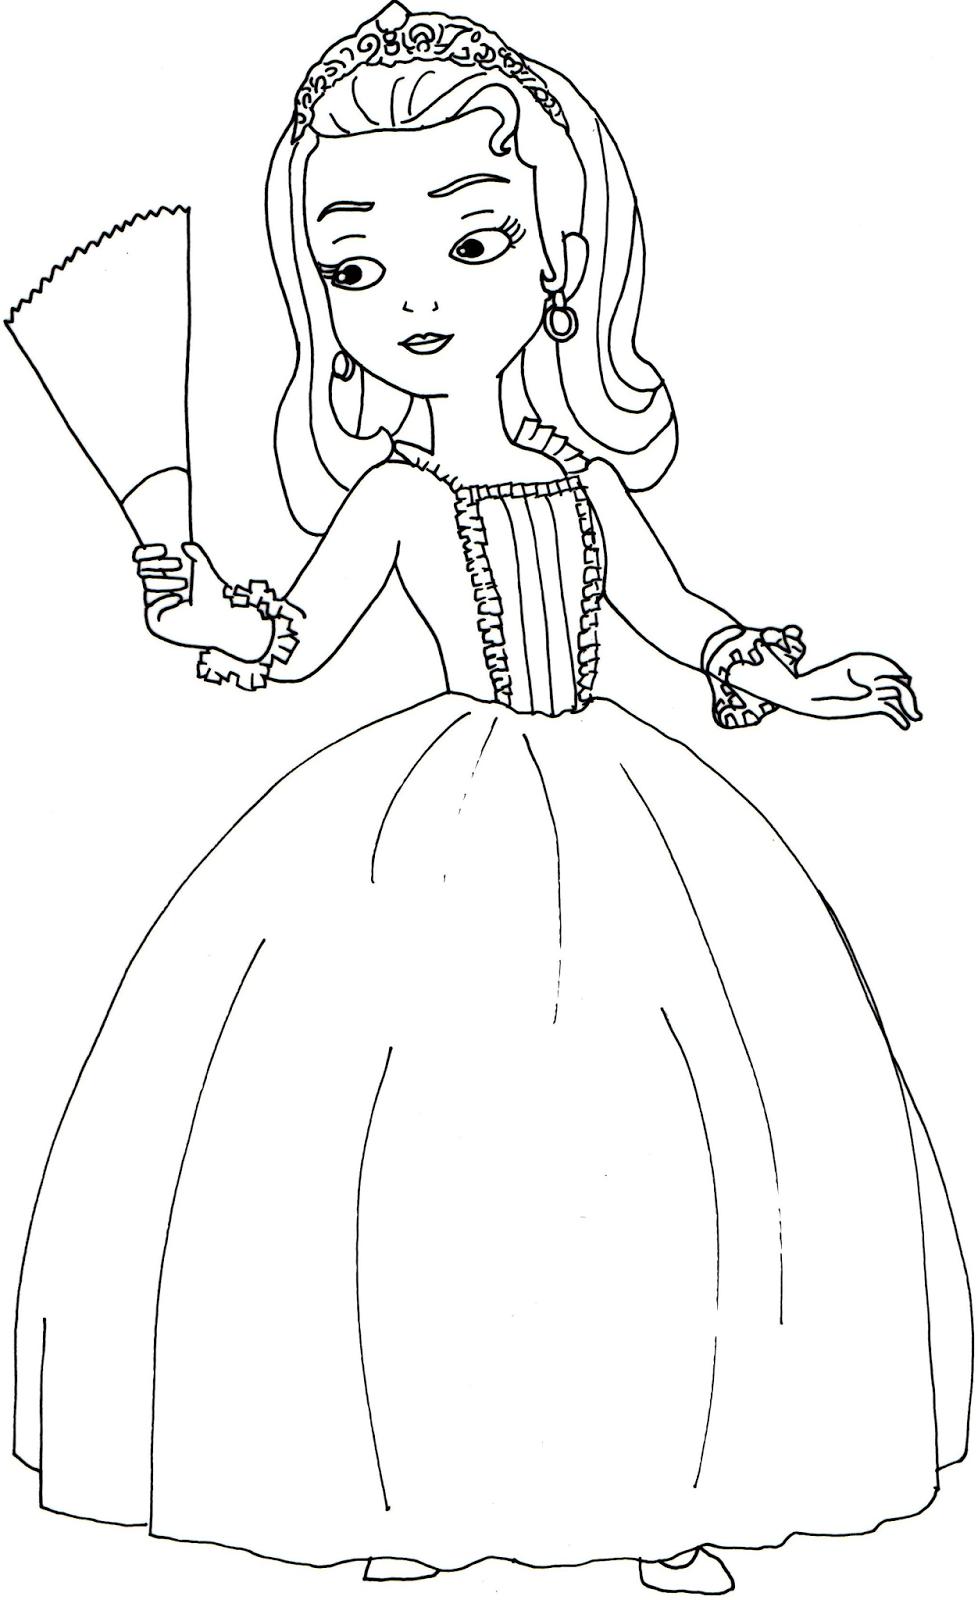 Princess amber coloring pages - Princess Amber Coloring Pages 0